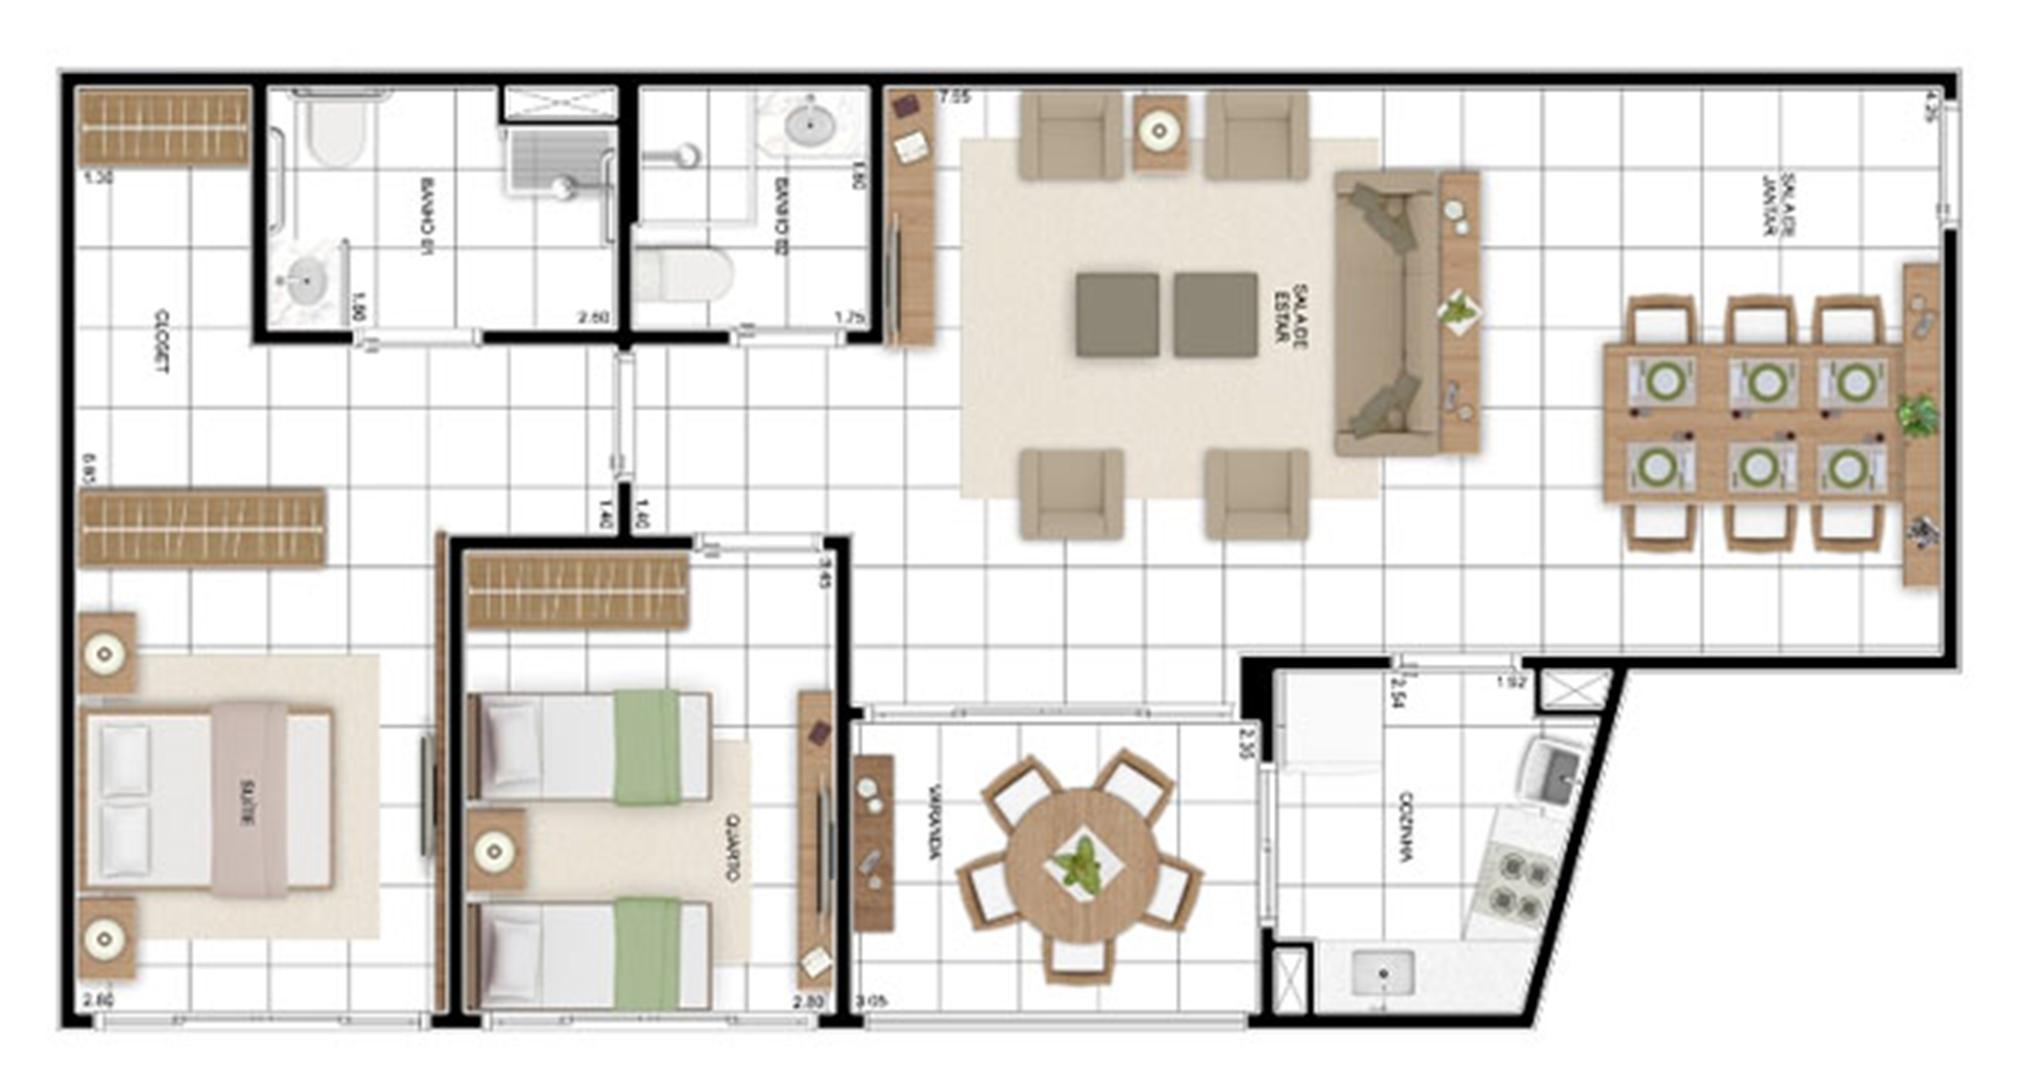 PLANTA - APTO TIPO D - 95 m² (ADAPTADA PARA PNE)  | In Mare Bali – Apartamento no  Distrito Litoral de Cotovelo - Parnamirim - Rio Grande do Norte